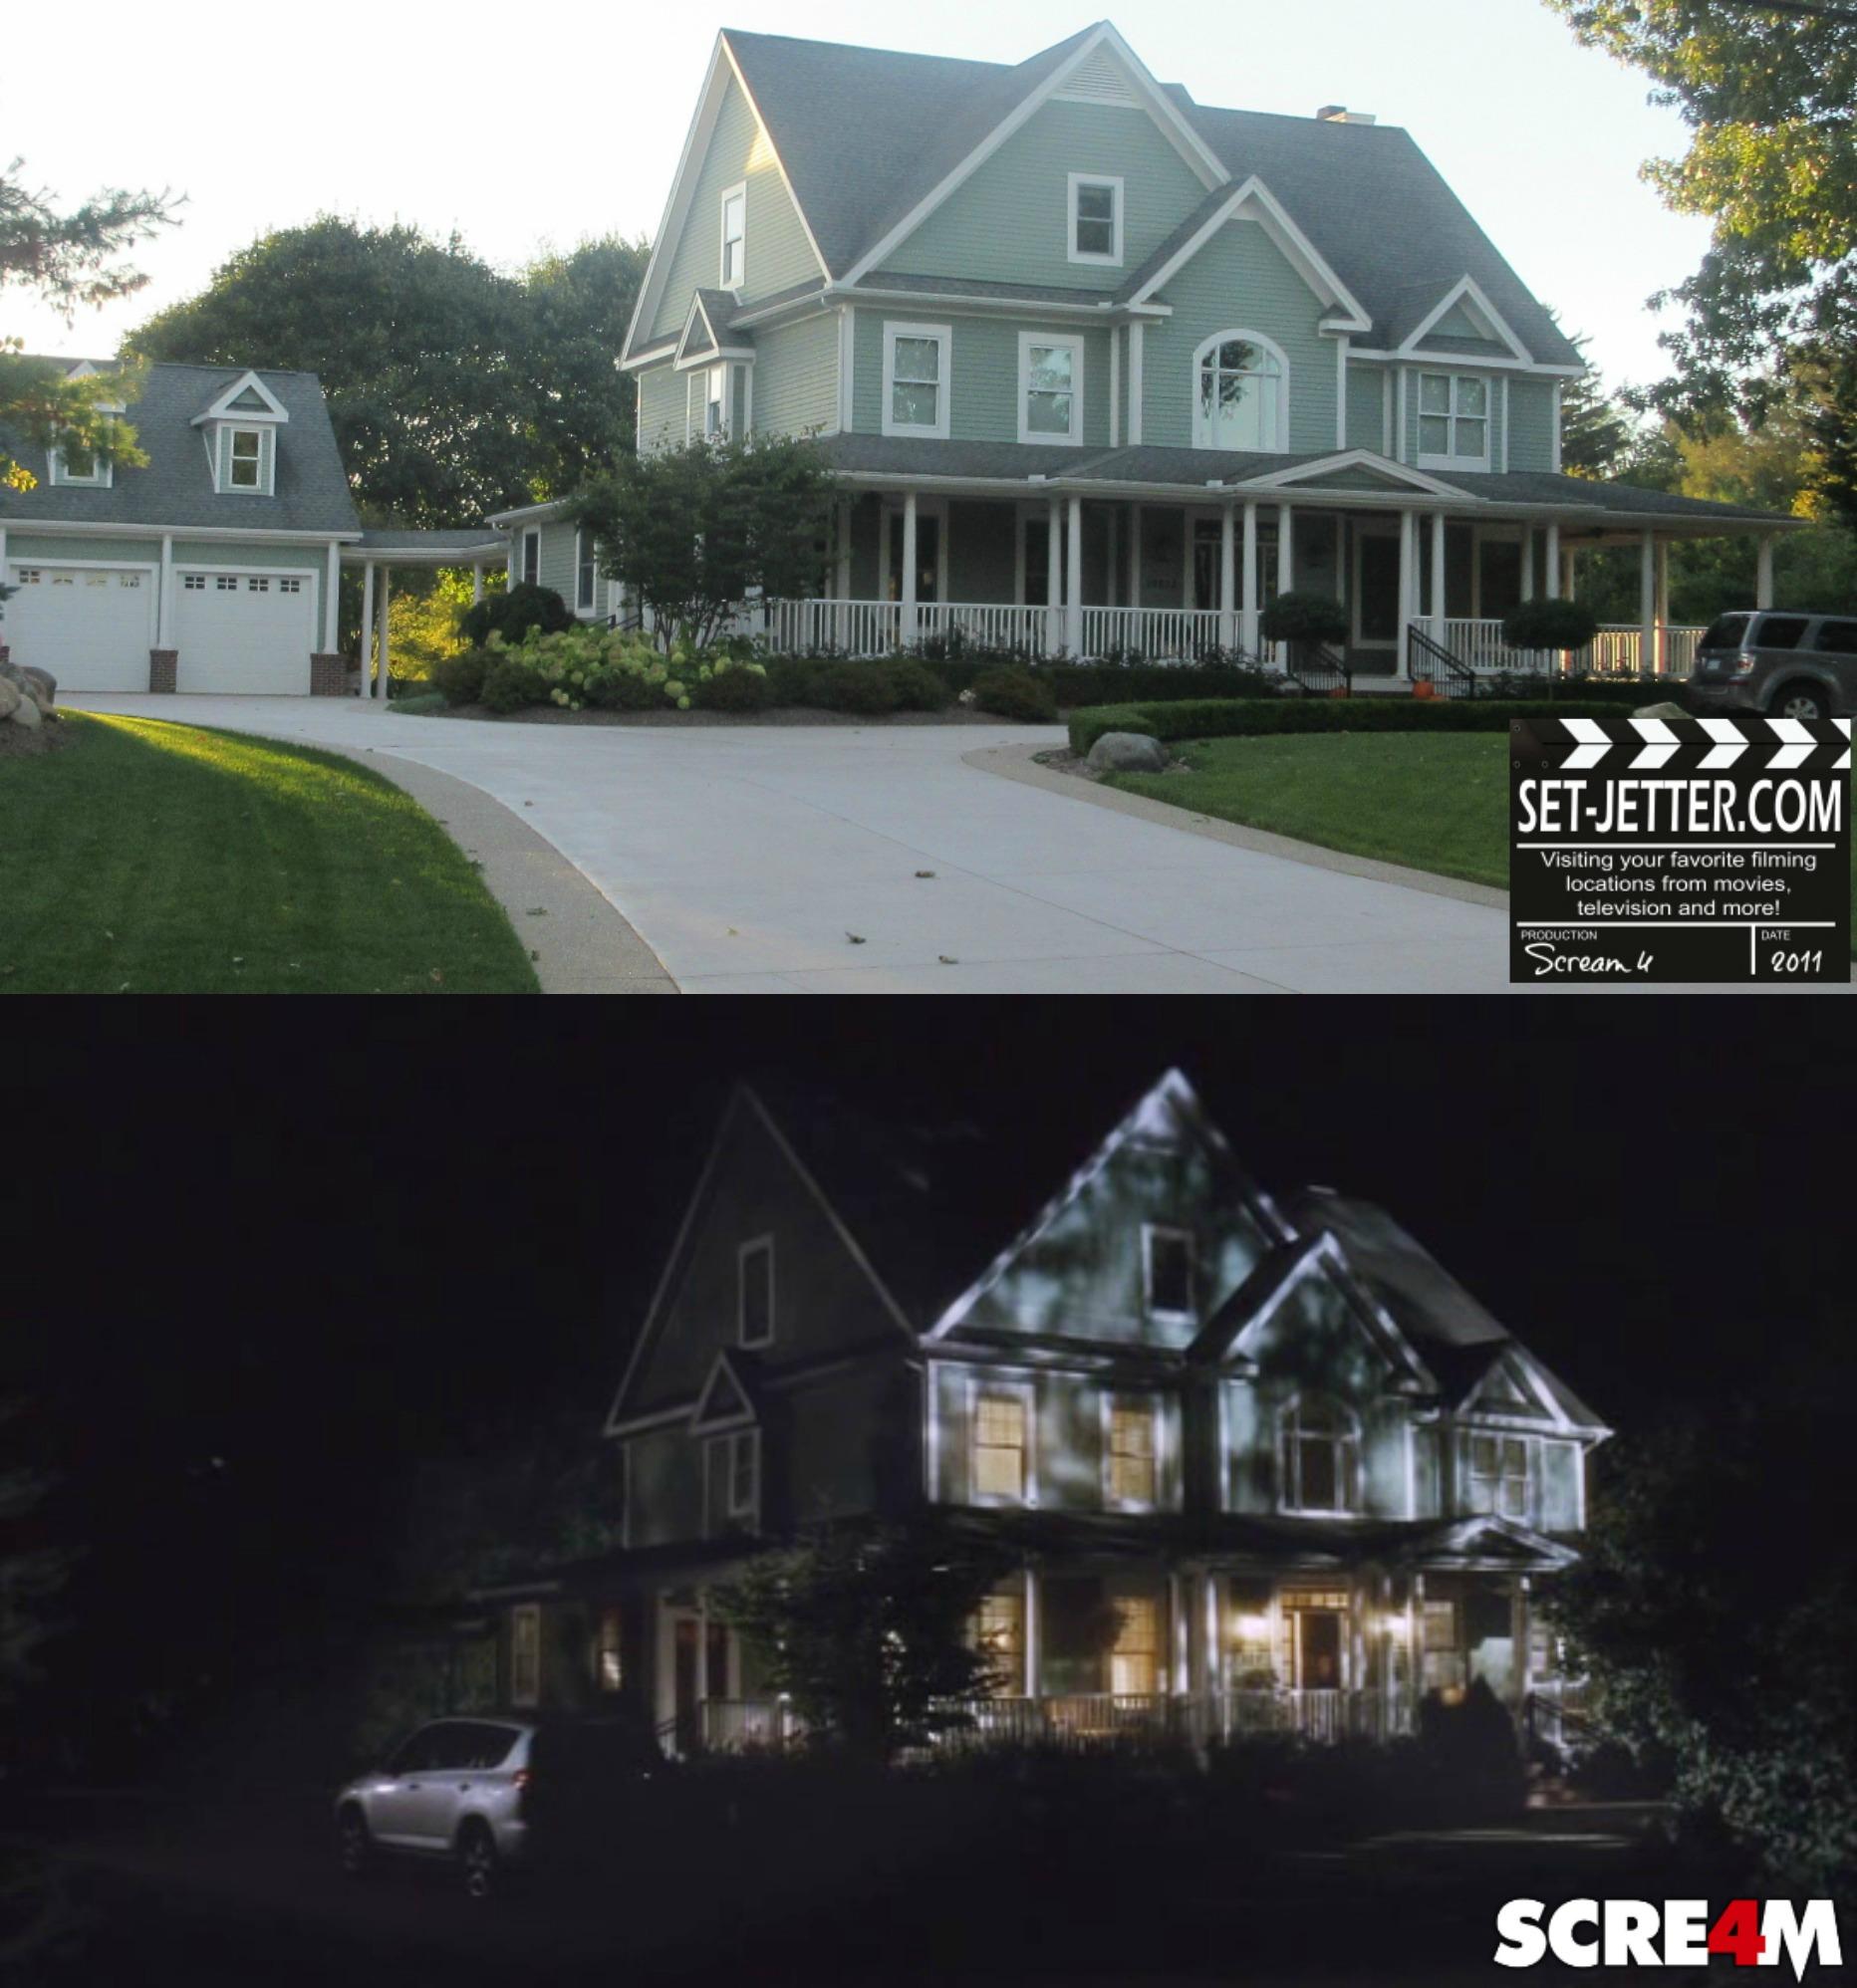 Scream4 comparison 139.jpg